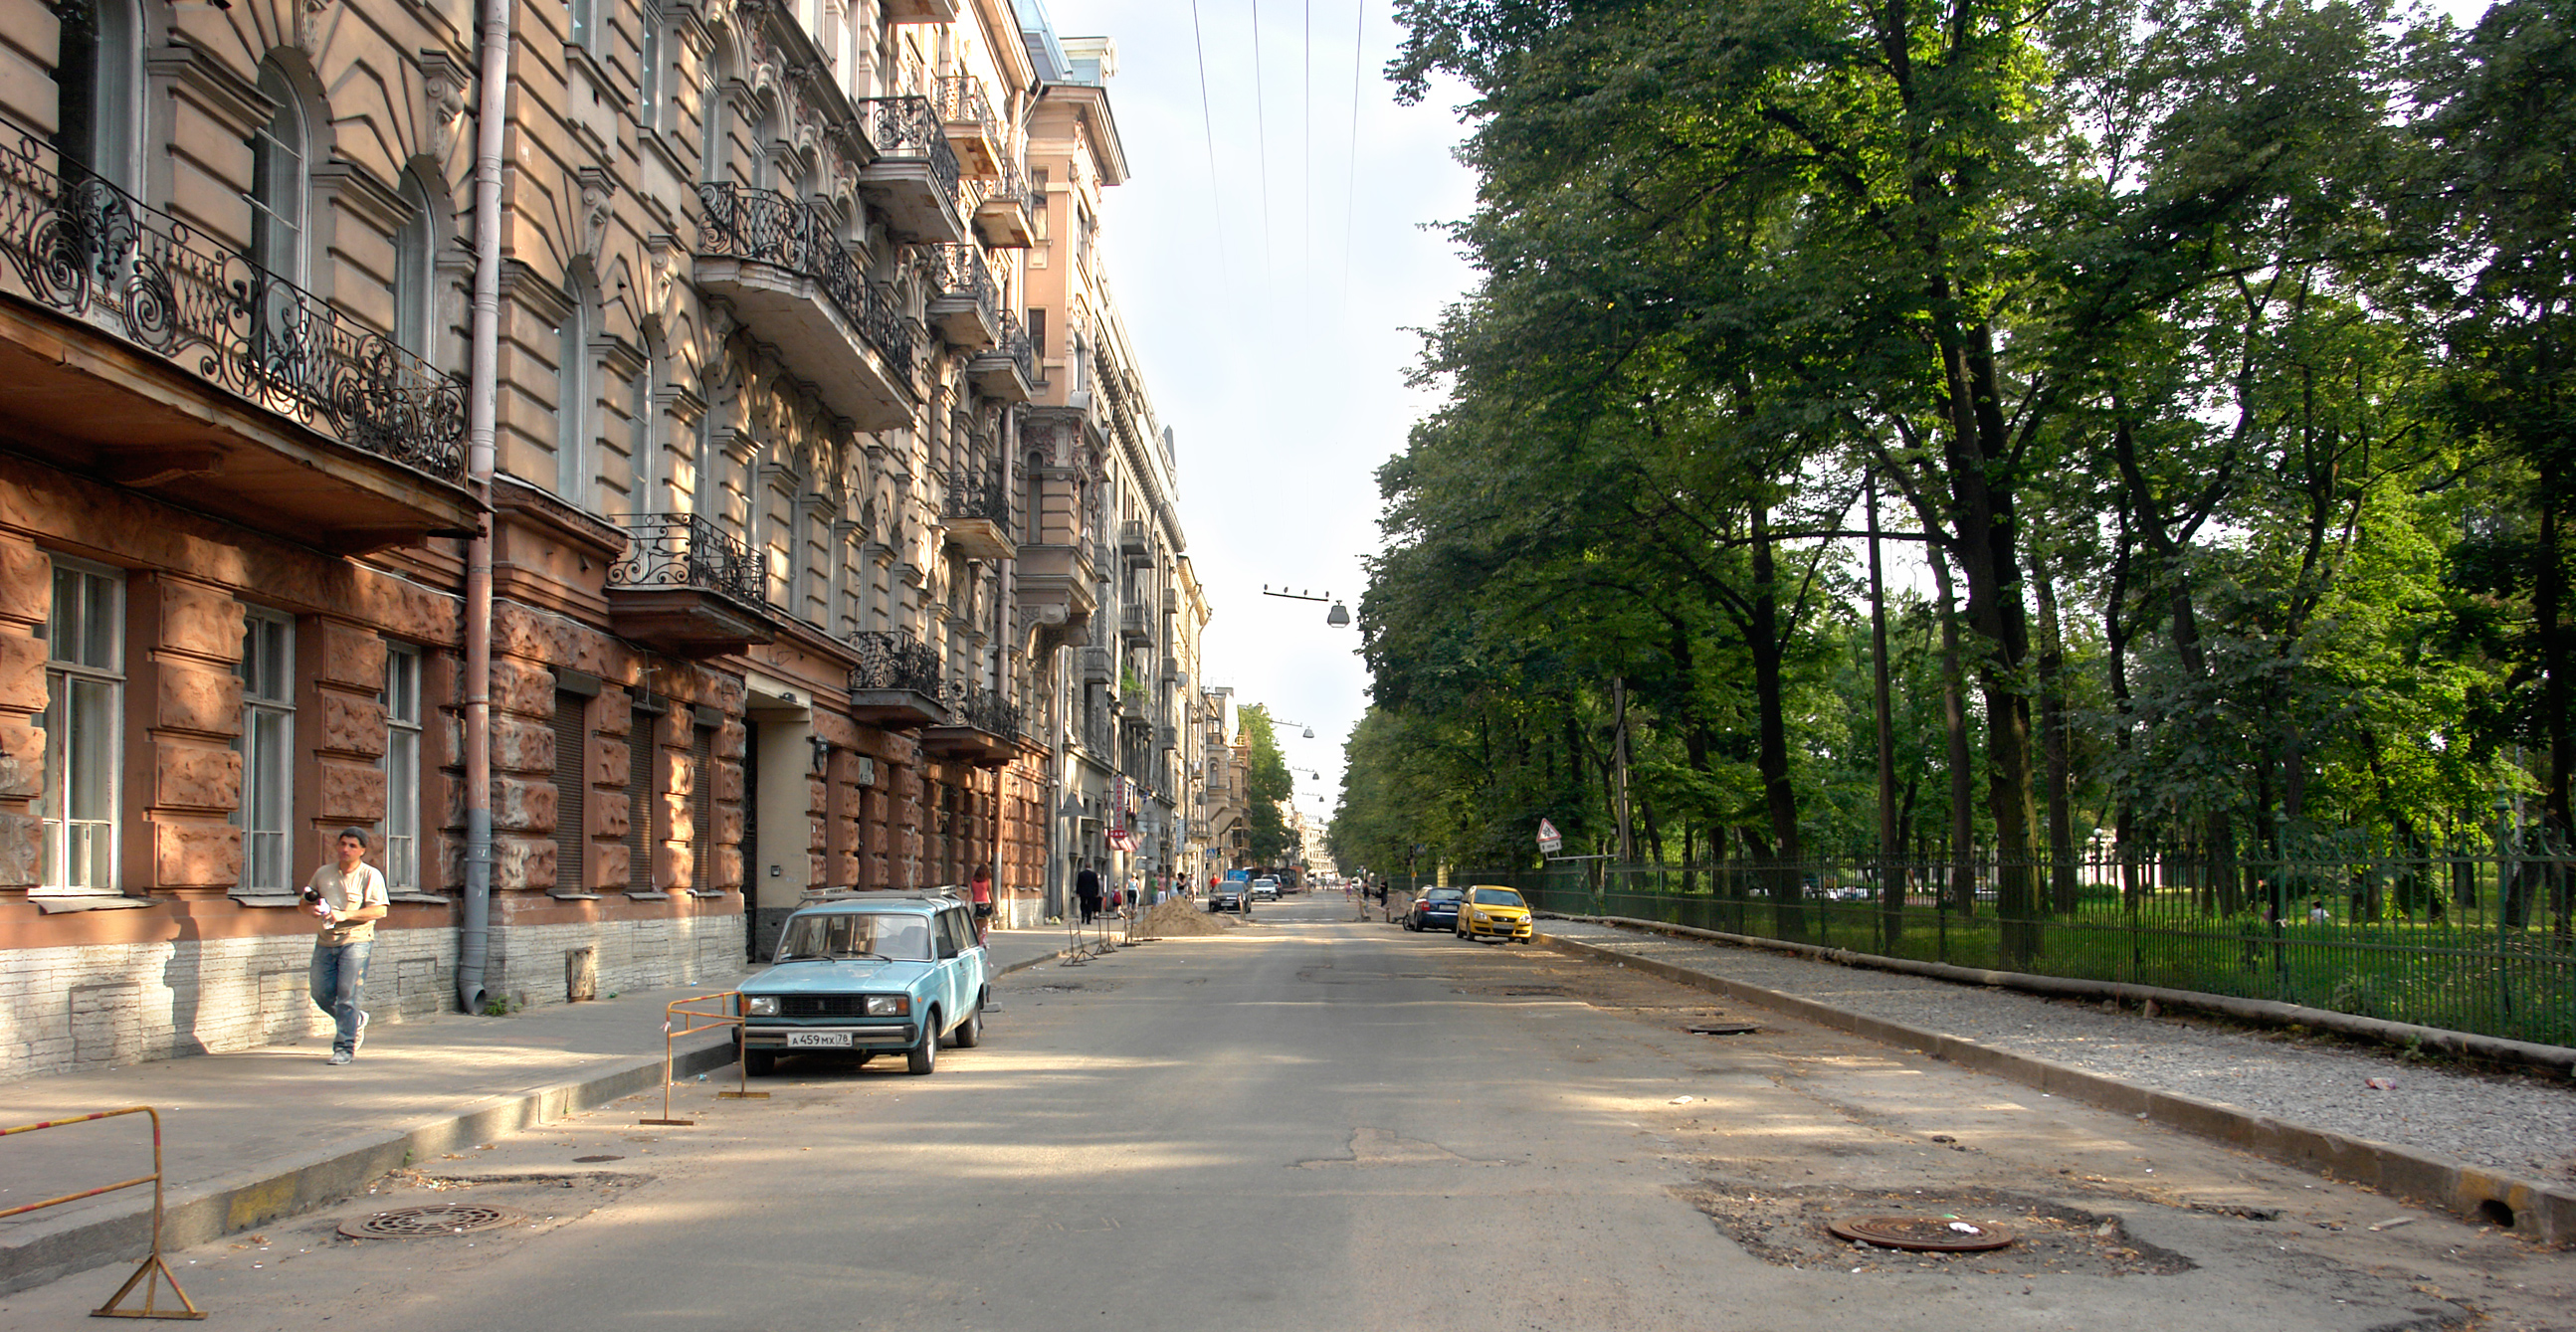 Файл:Таврическая улица.jpg — Википедия: ru.wikipedia.org/wiki/Файл:Таврическая_улица.jpg